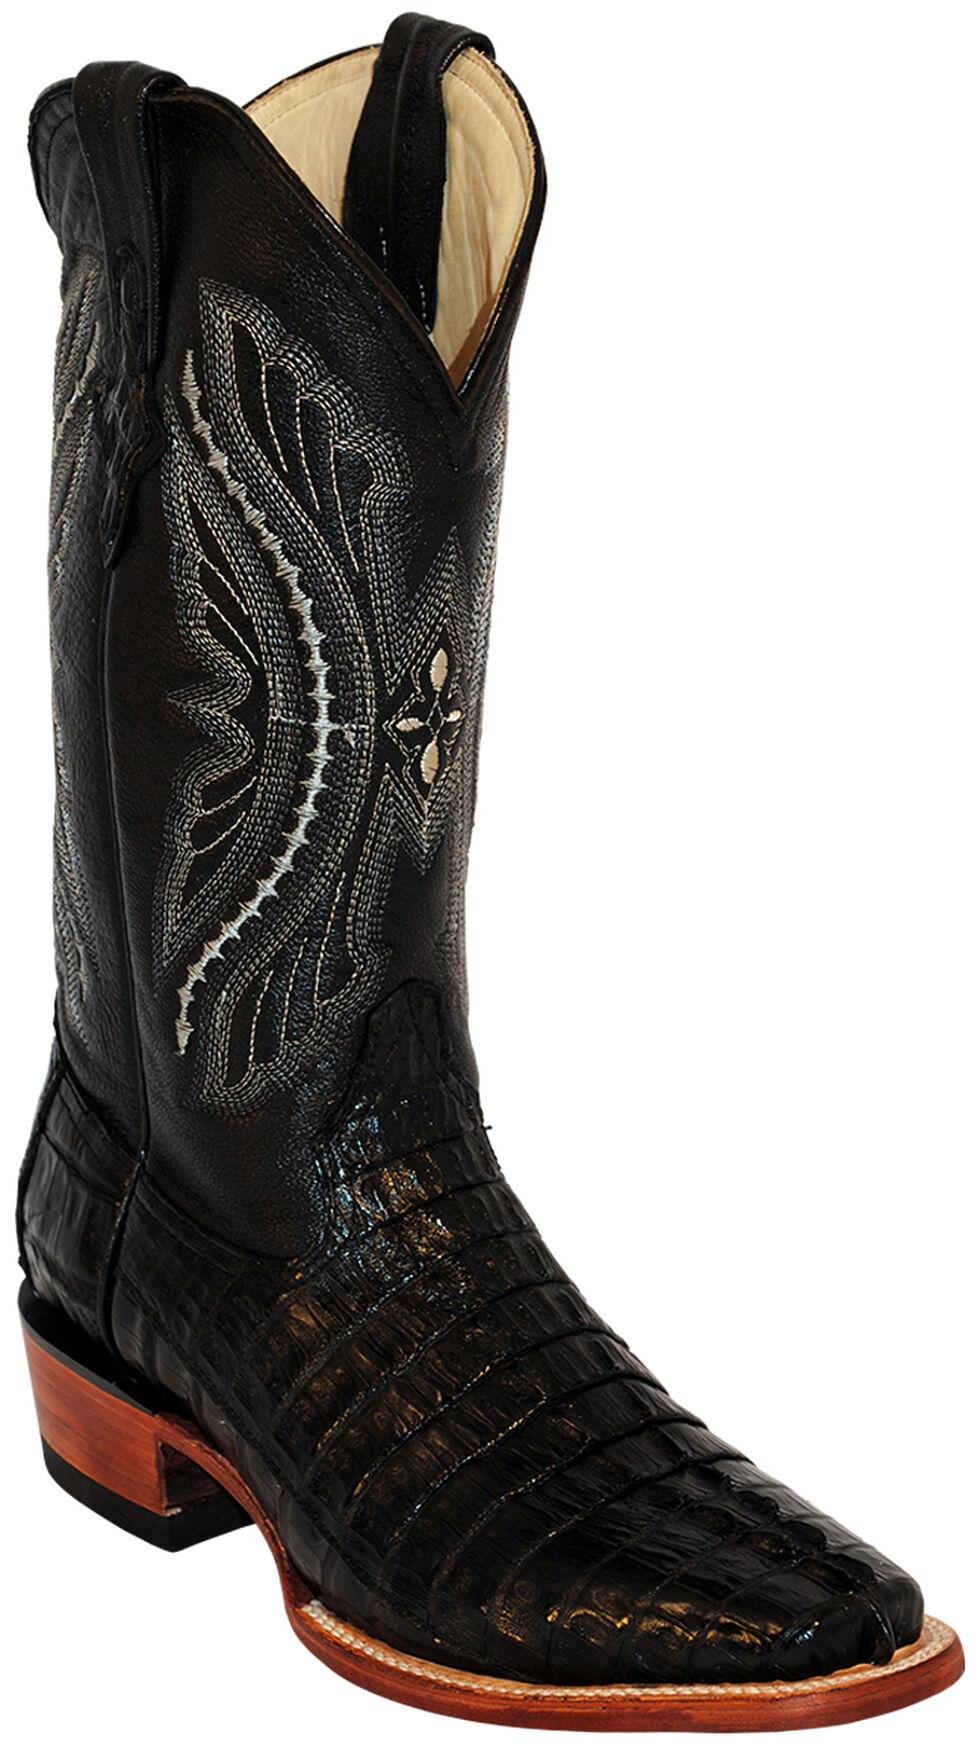 Ferrini Caiman Tail Exotic Cowboy Boots - Wide Square Toe, Black, hi-res